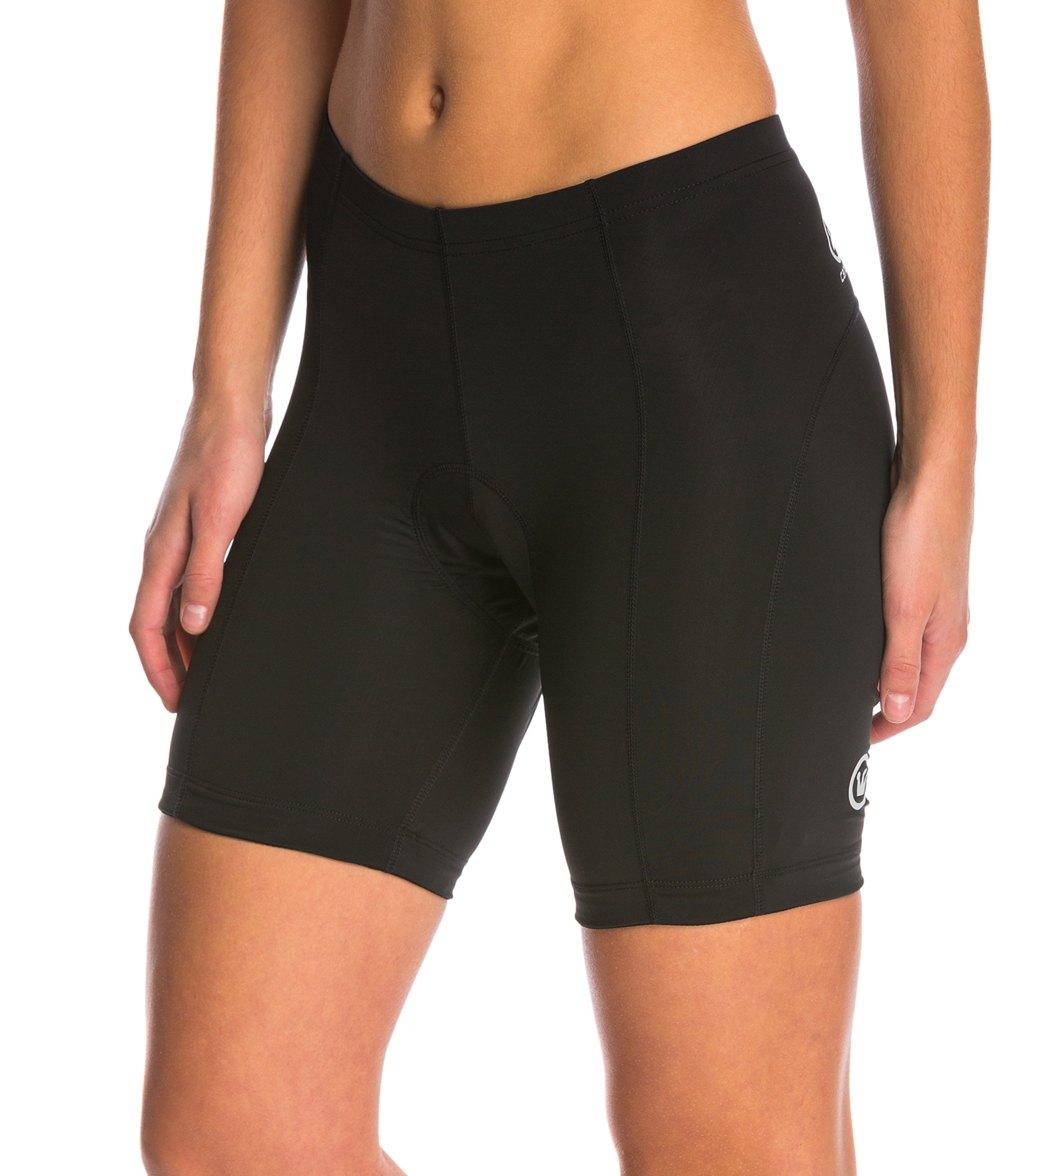 Canari Women s Pro Gel Cycling Shorts at SwimOutlet.com - Free Shipping 977d8ac47